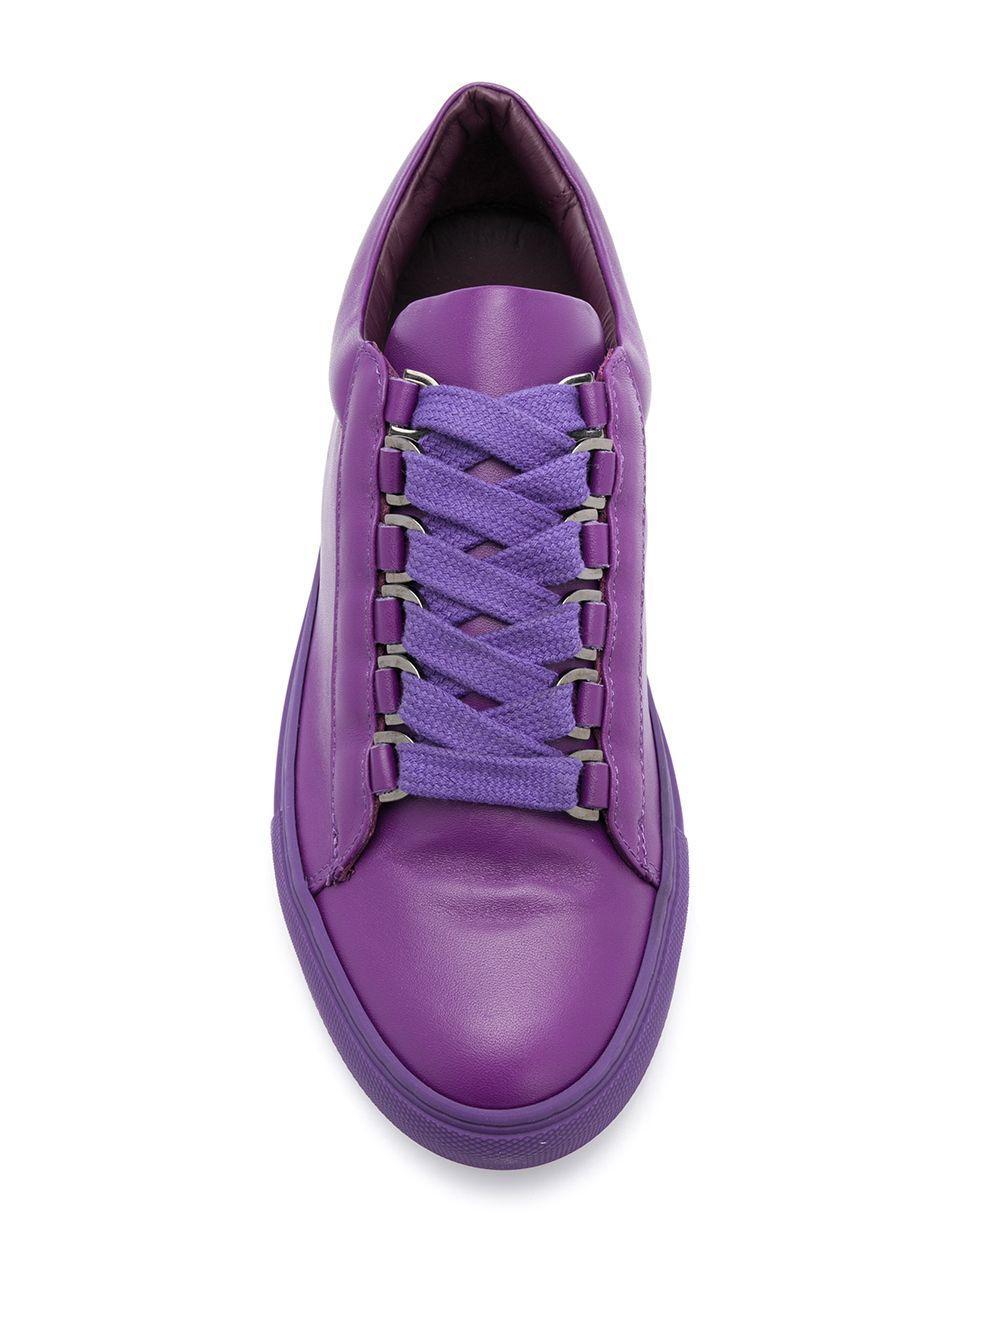 Zapatillas Adenka Christian Wijnants de color Morado